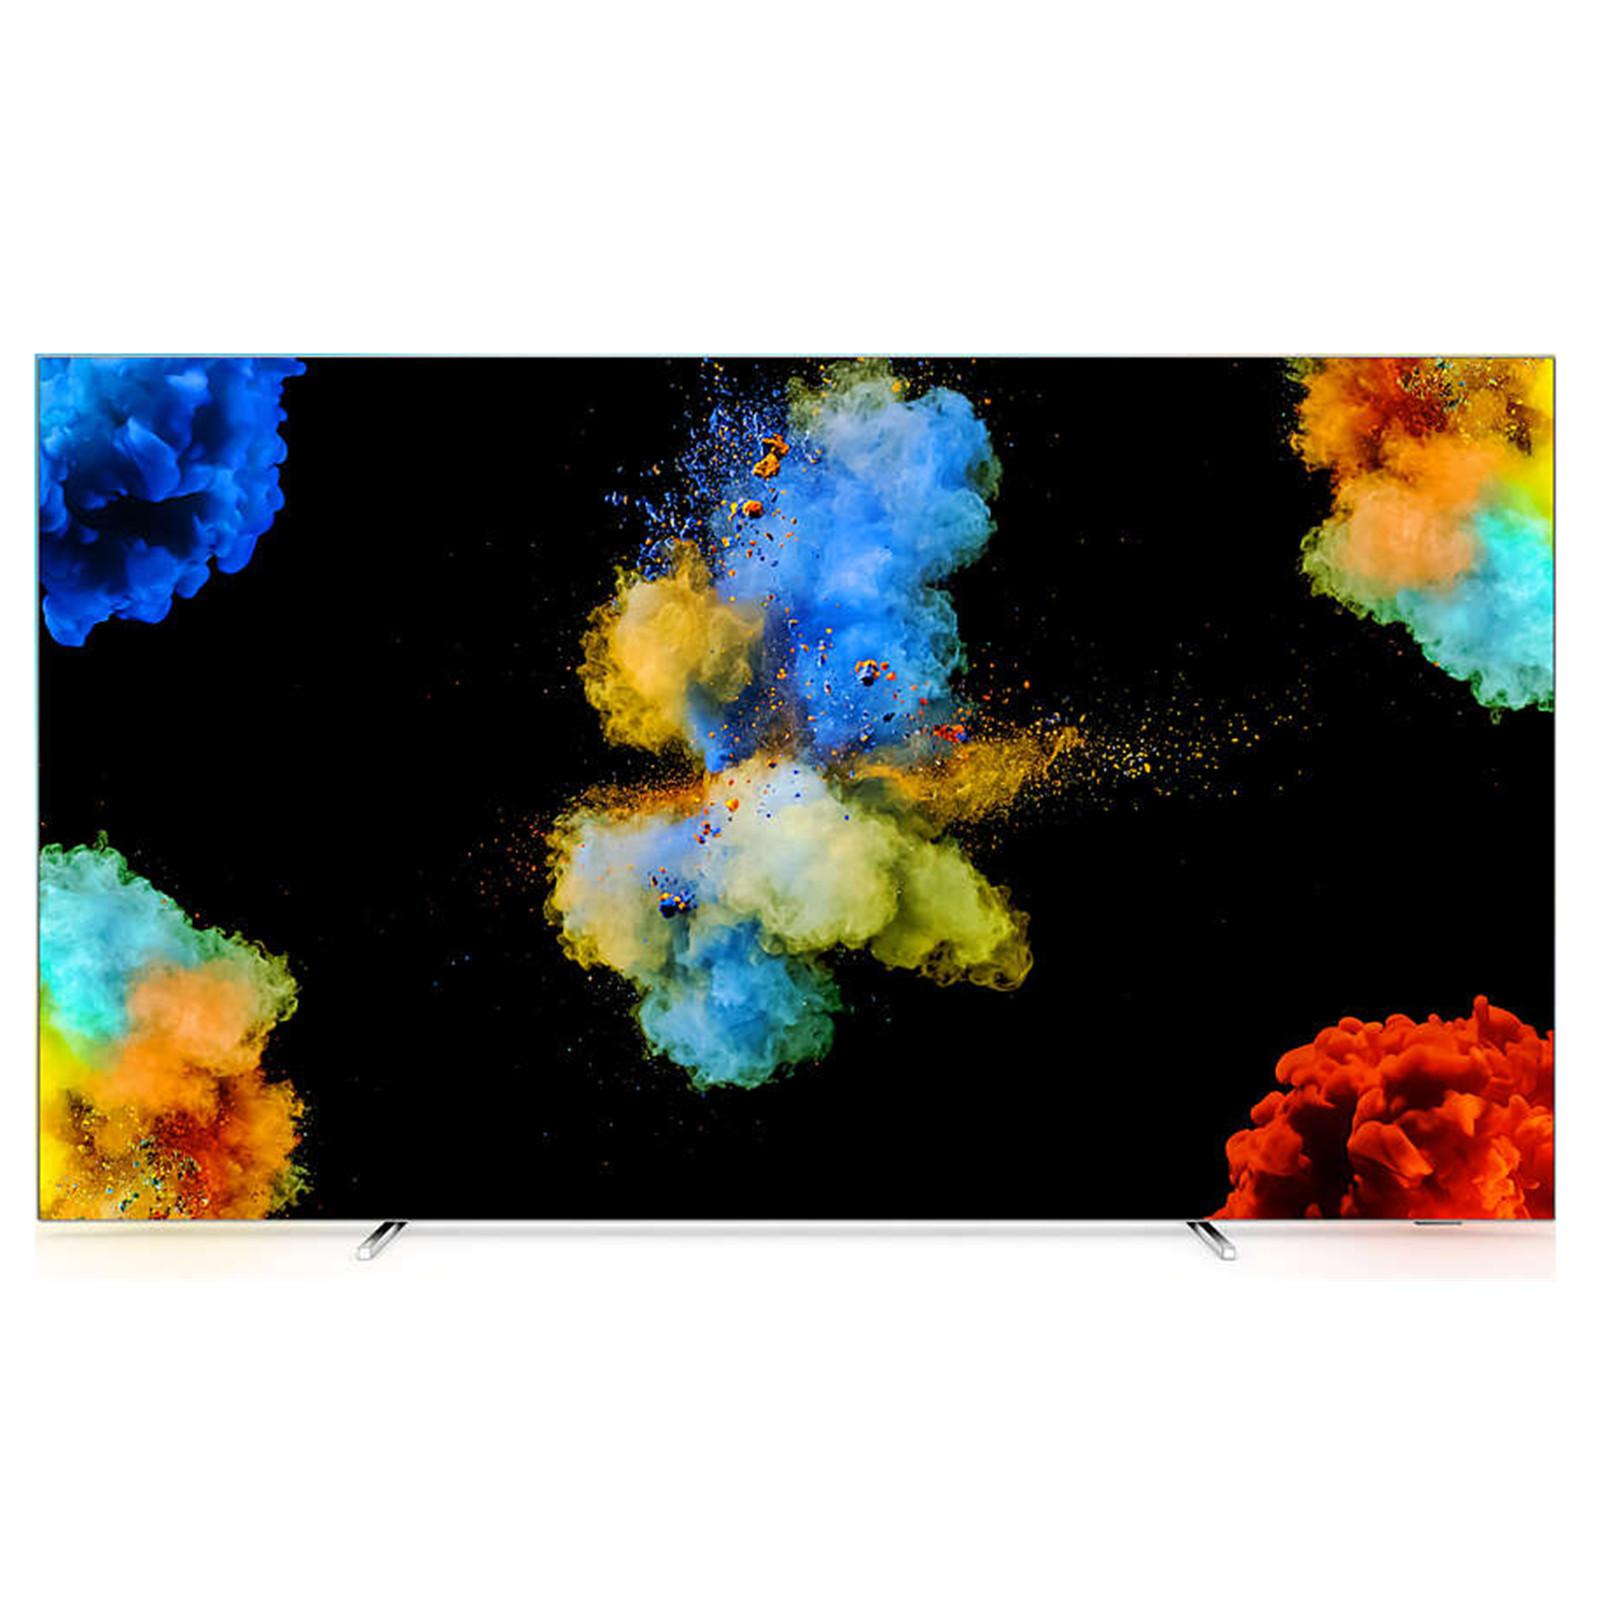 "Philips 55OLED803/75 55"" Razor Slim 4K UHD OLED Android Smart TV image"